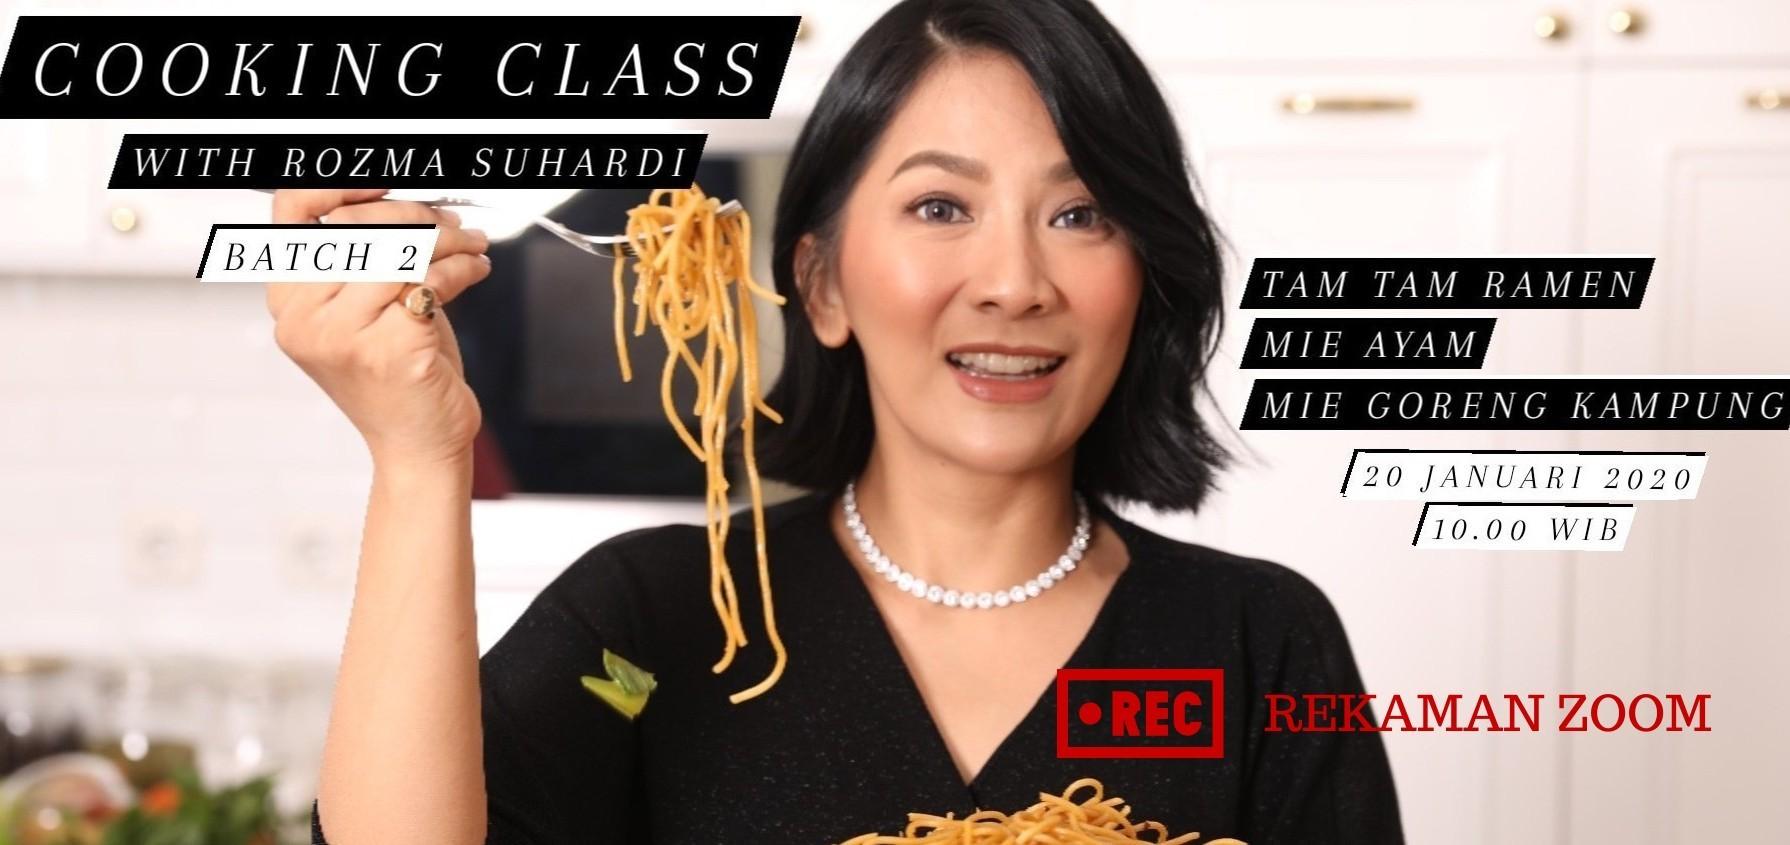 Rekaman Zoom Cooking Class with Rozma Suhardi Aneka Mie